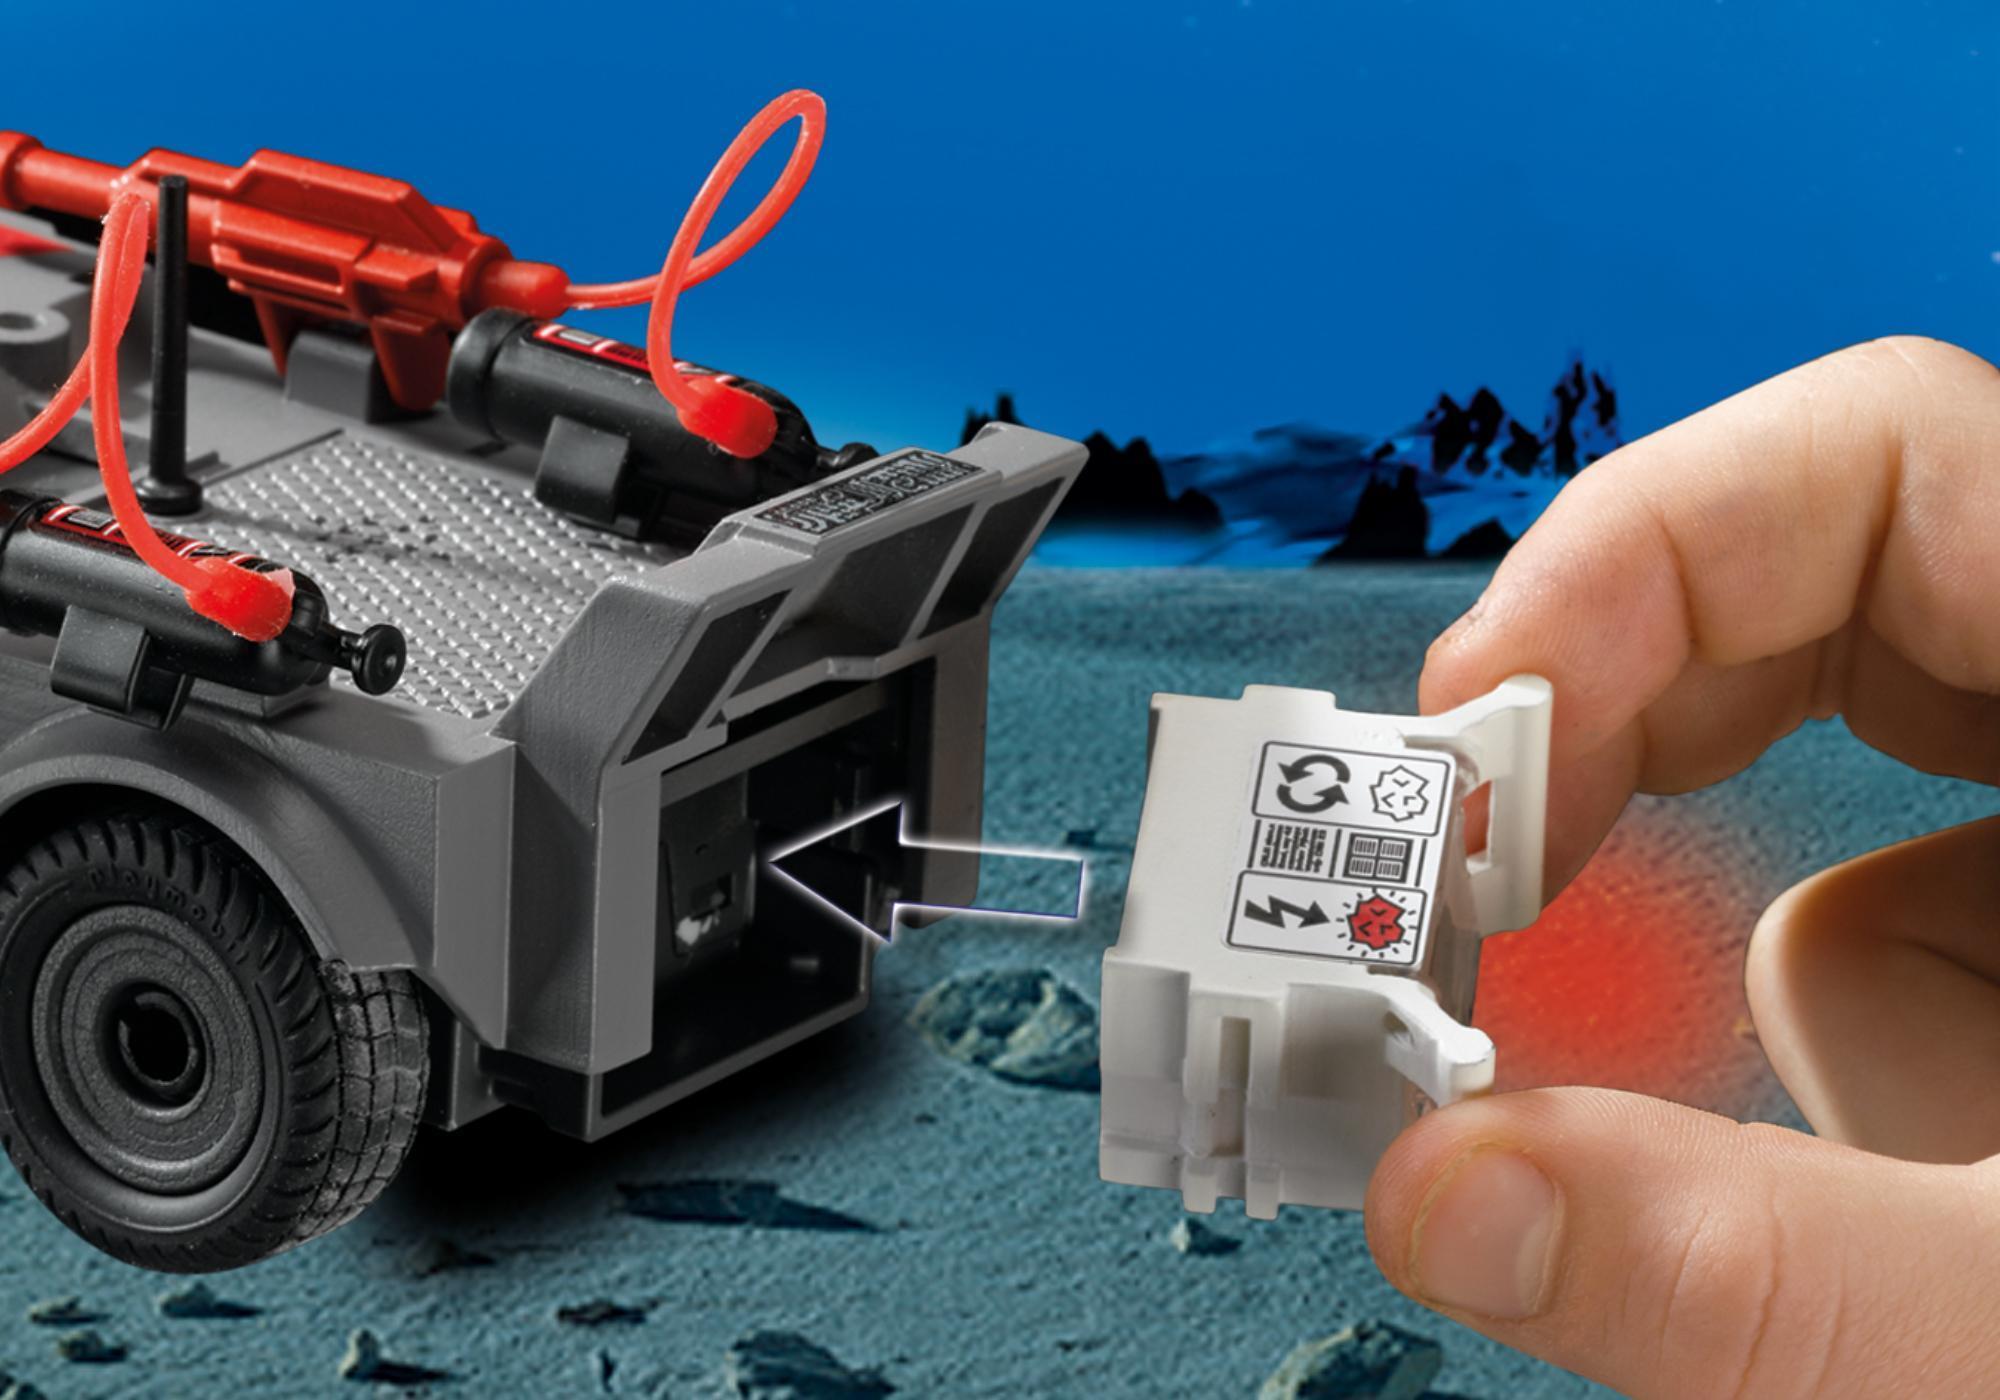 http://media.playmobil.com/i/playmobil/5156_product_extra1/Stealer mit K.O.-Leuchtkanone